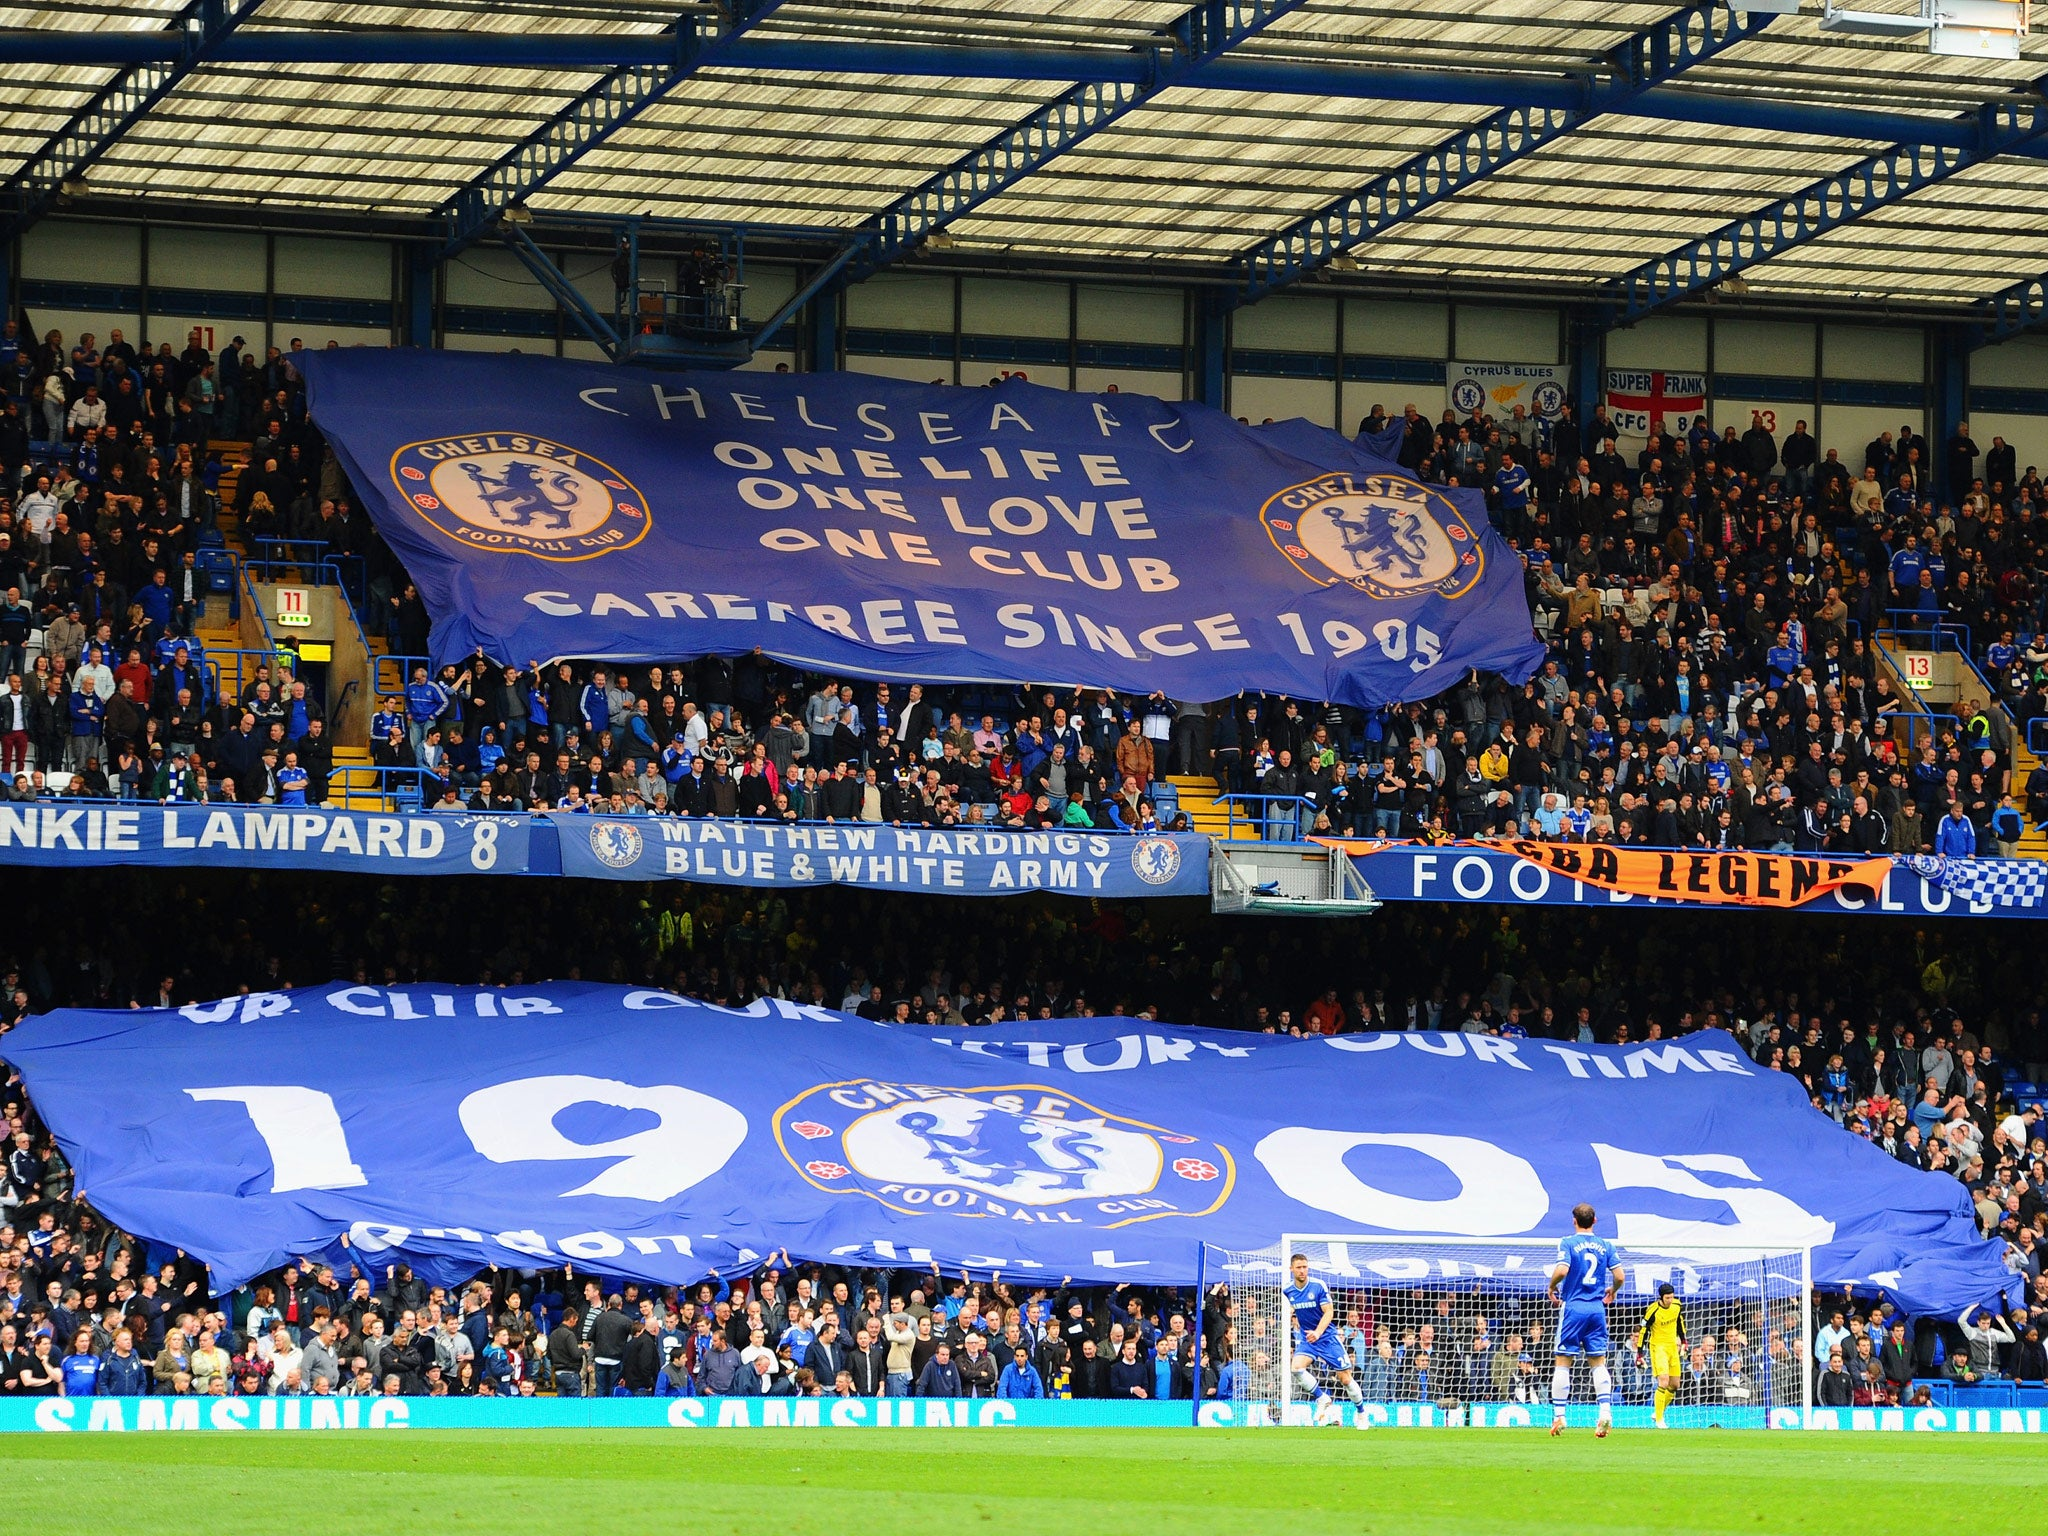 Chelsea vs Everton live: Latest score and updates from Stamford Bridge